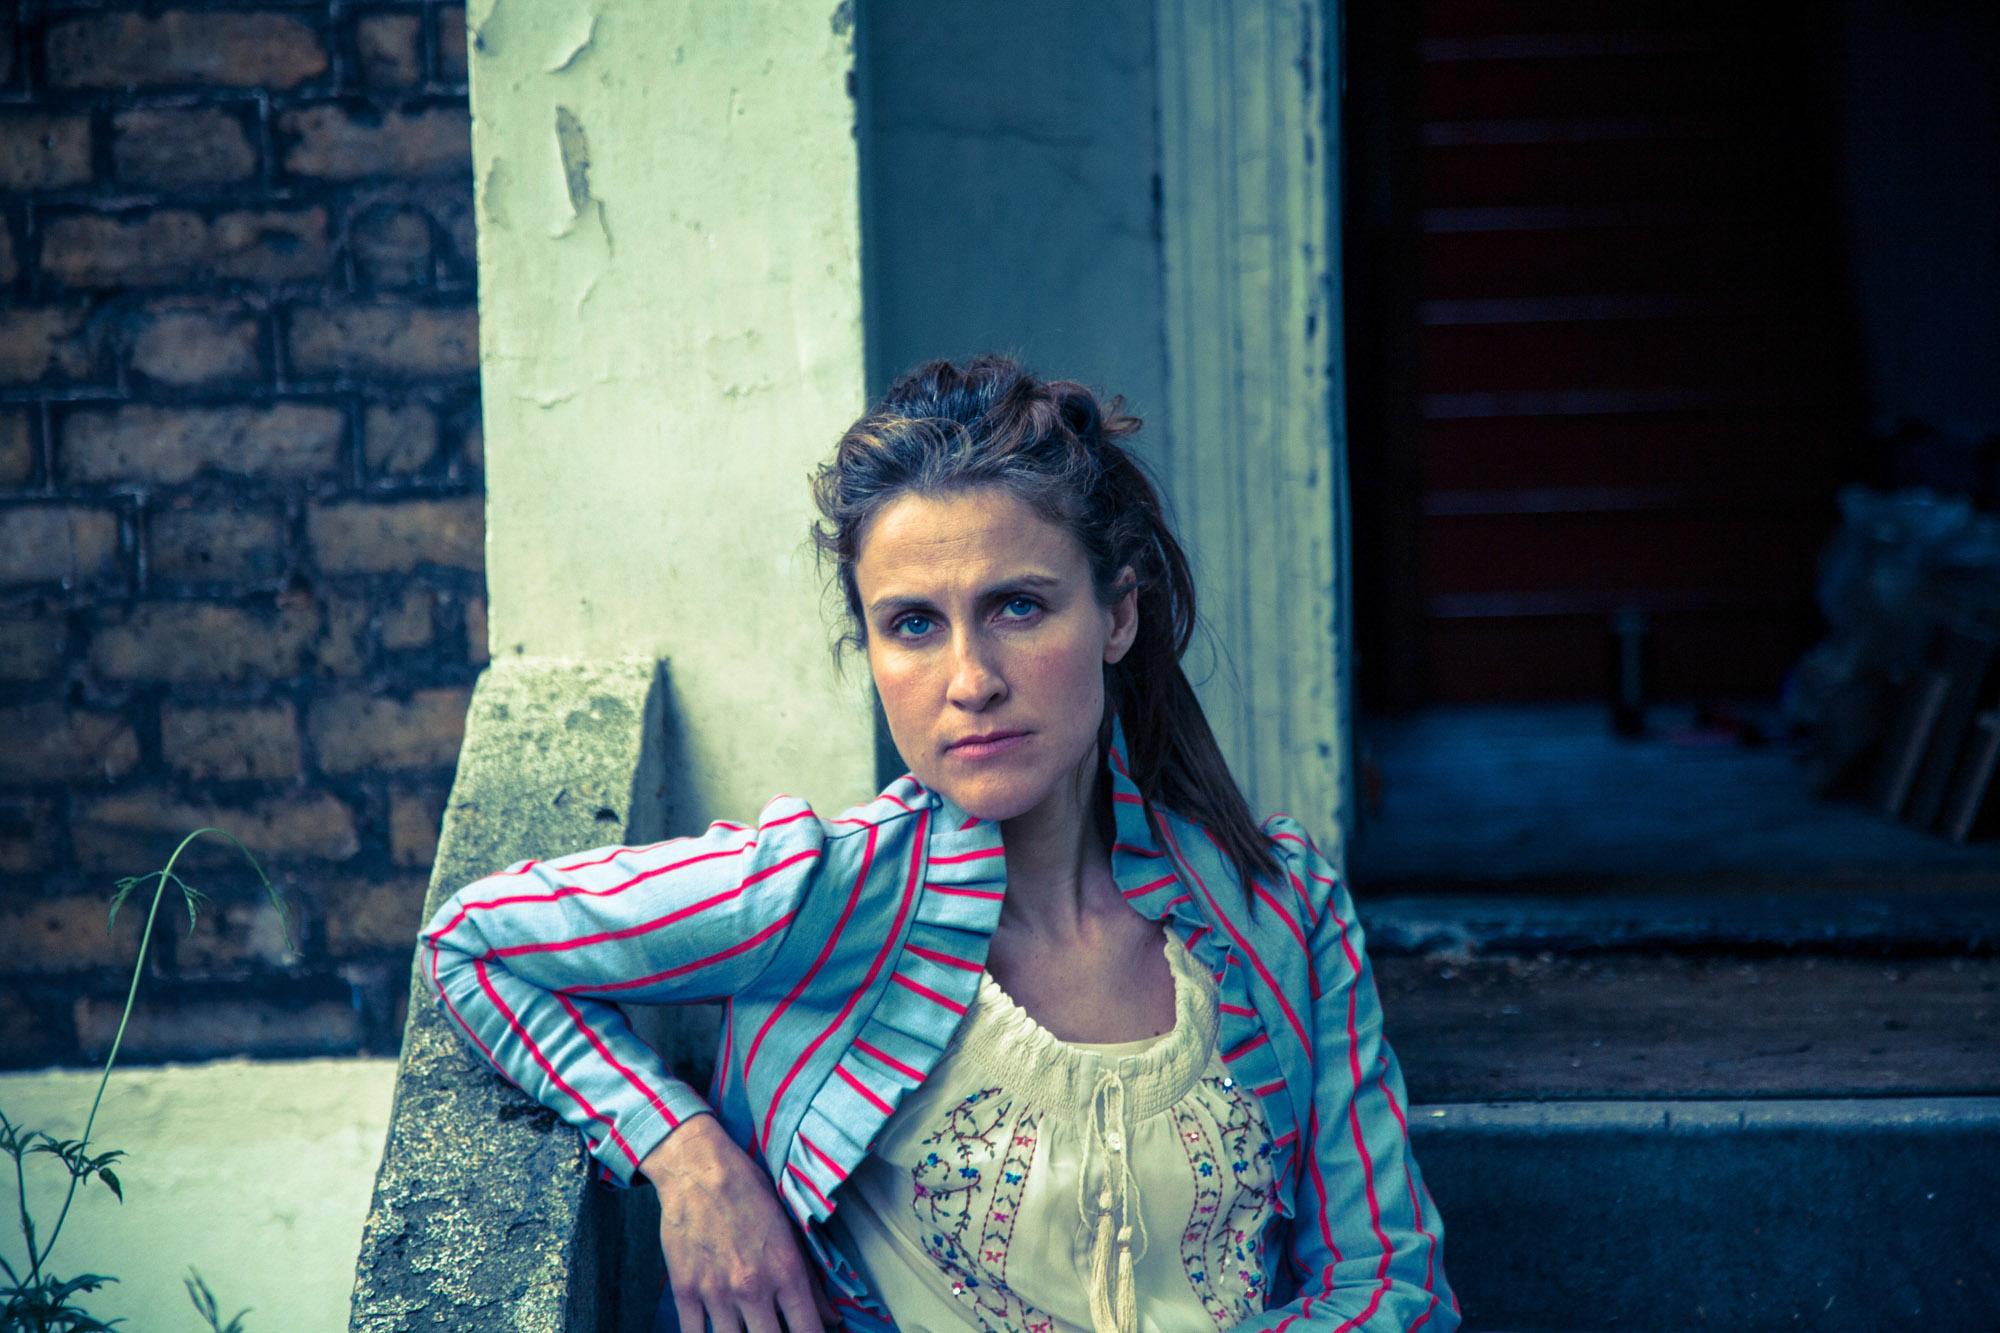 portraits-photographer-oxford-london-jonathan-self-photography_-12.jpg